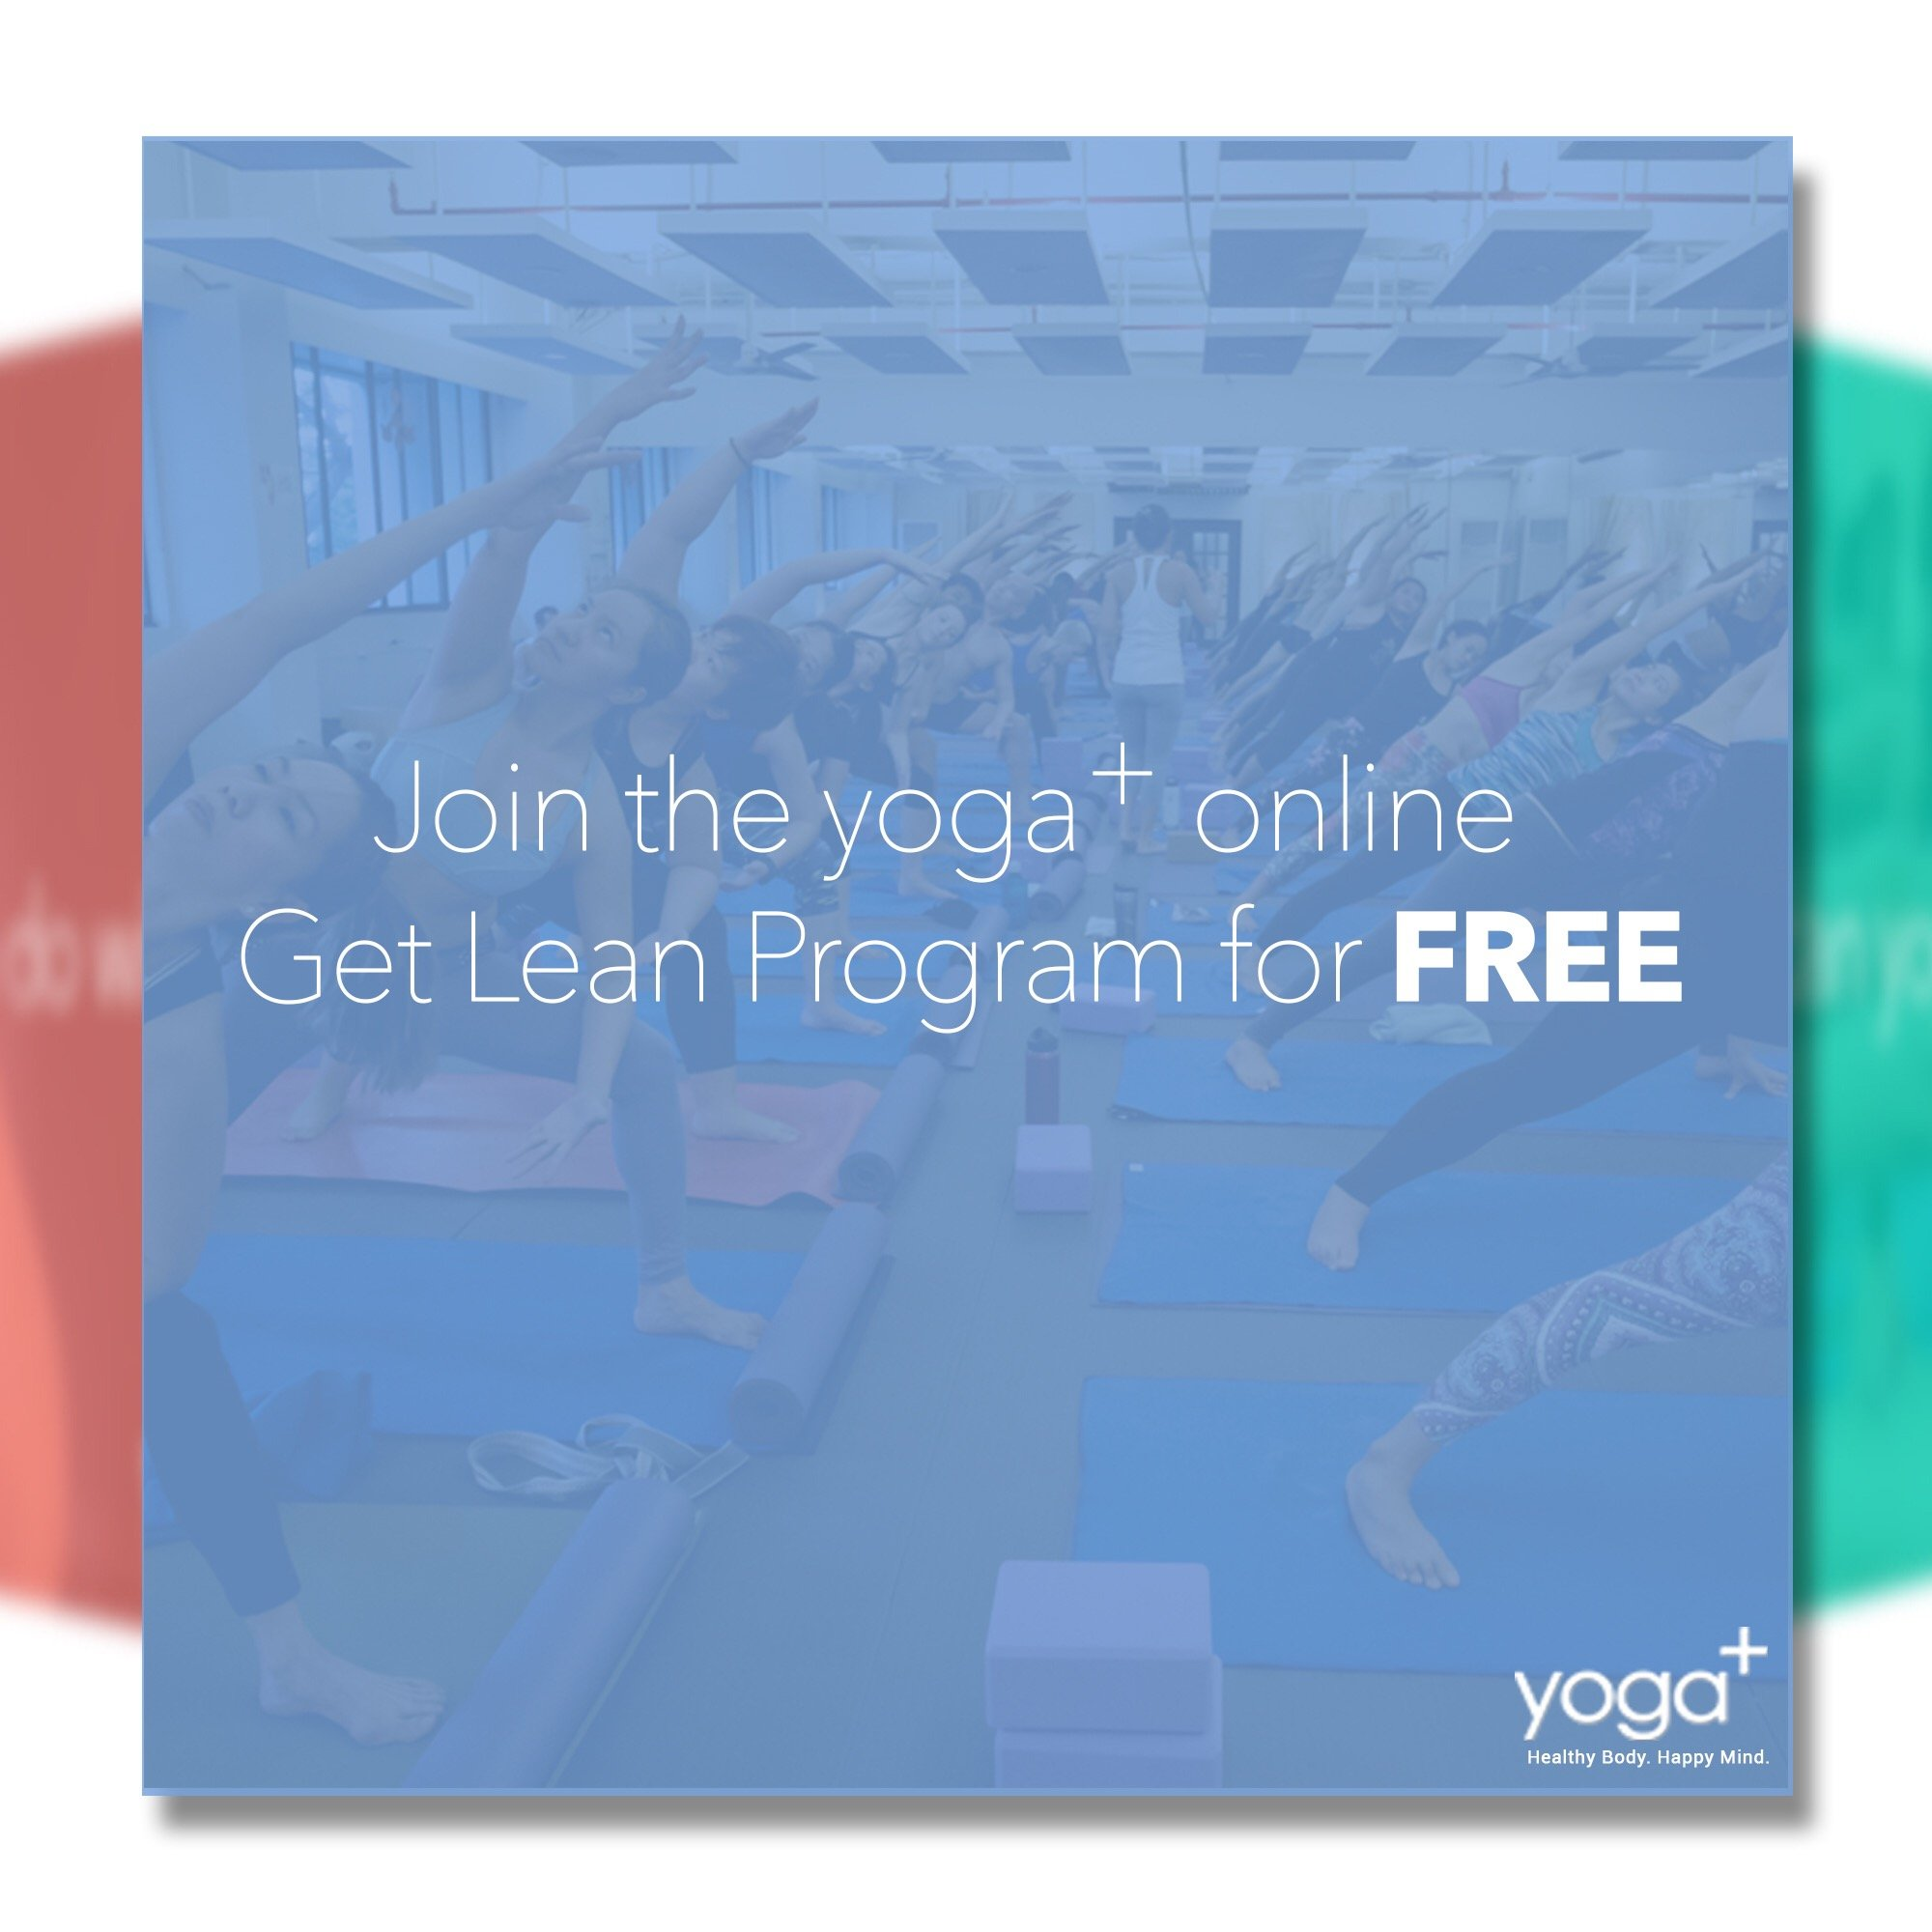 yoga+ Get Lean Program 4